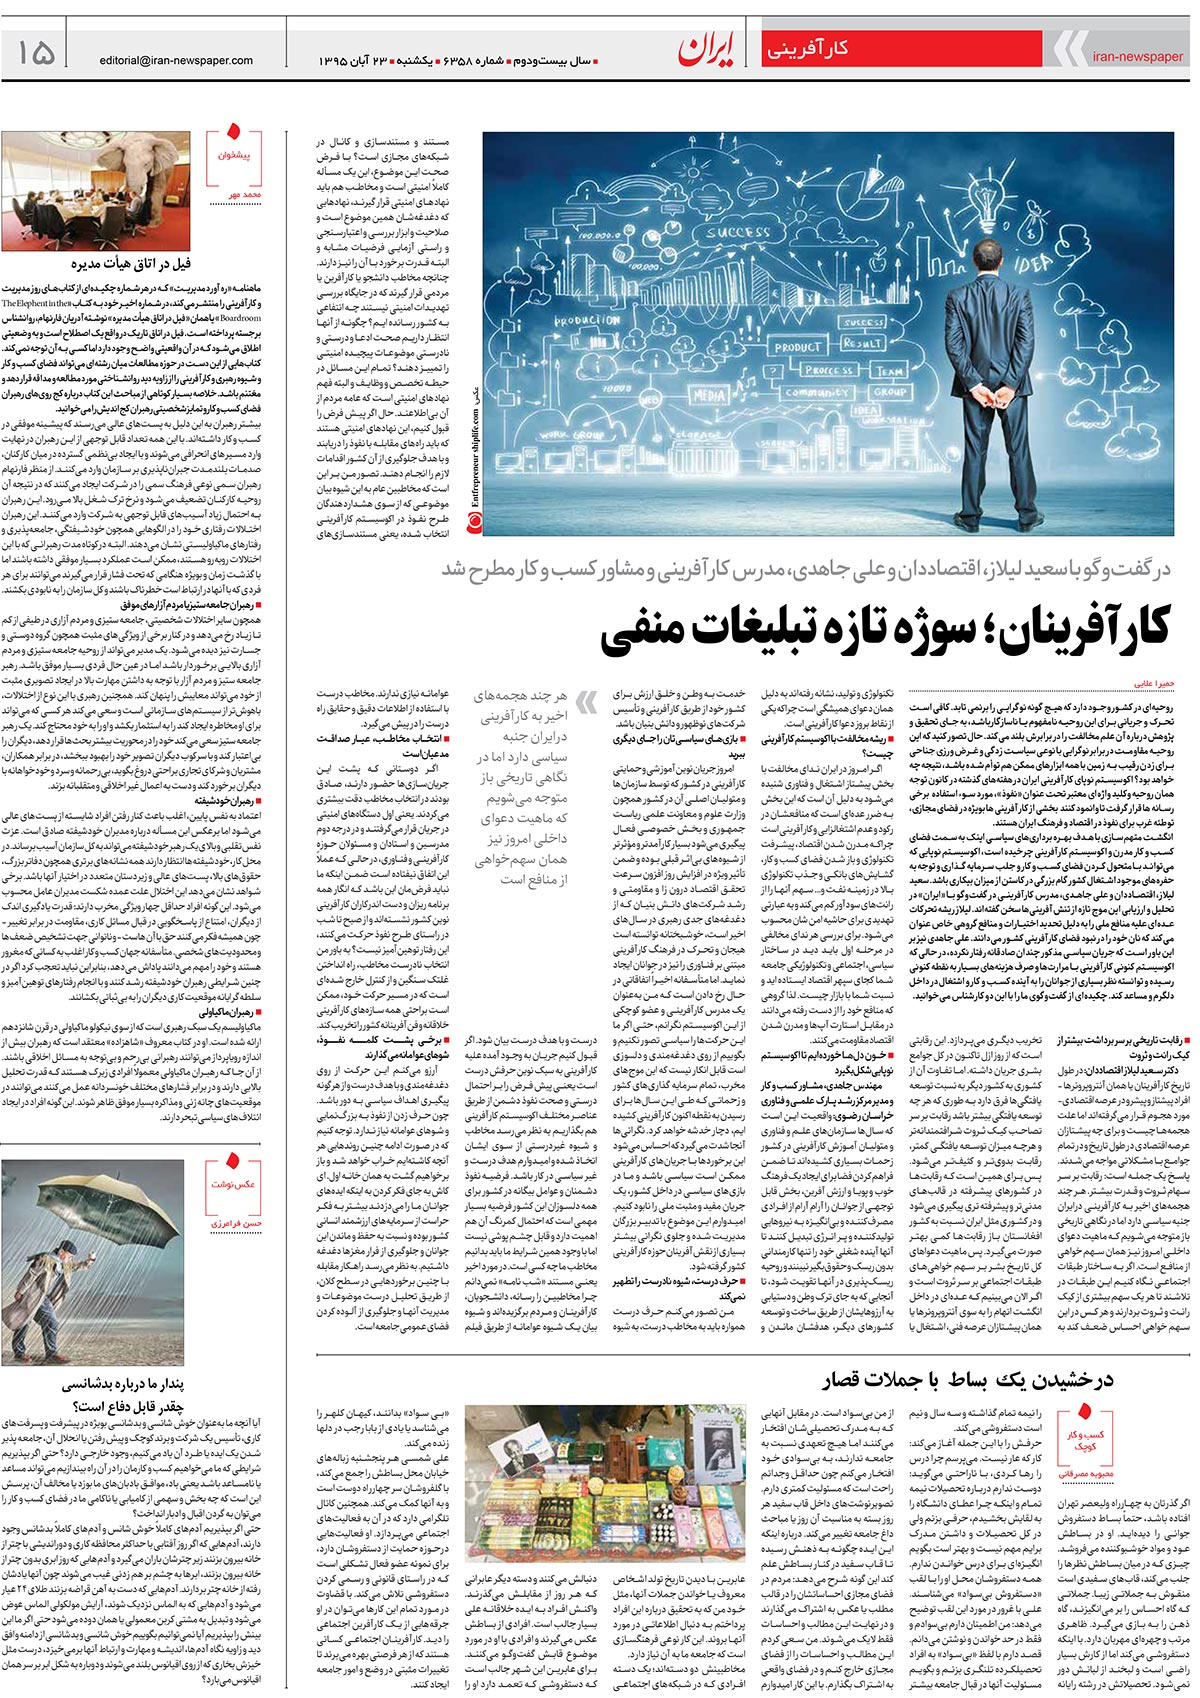 irannewspaper36938